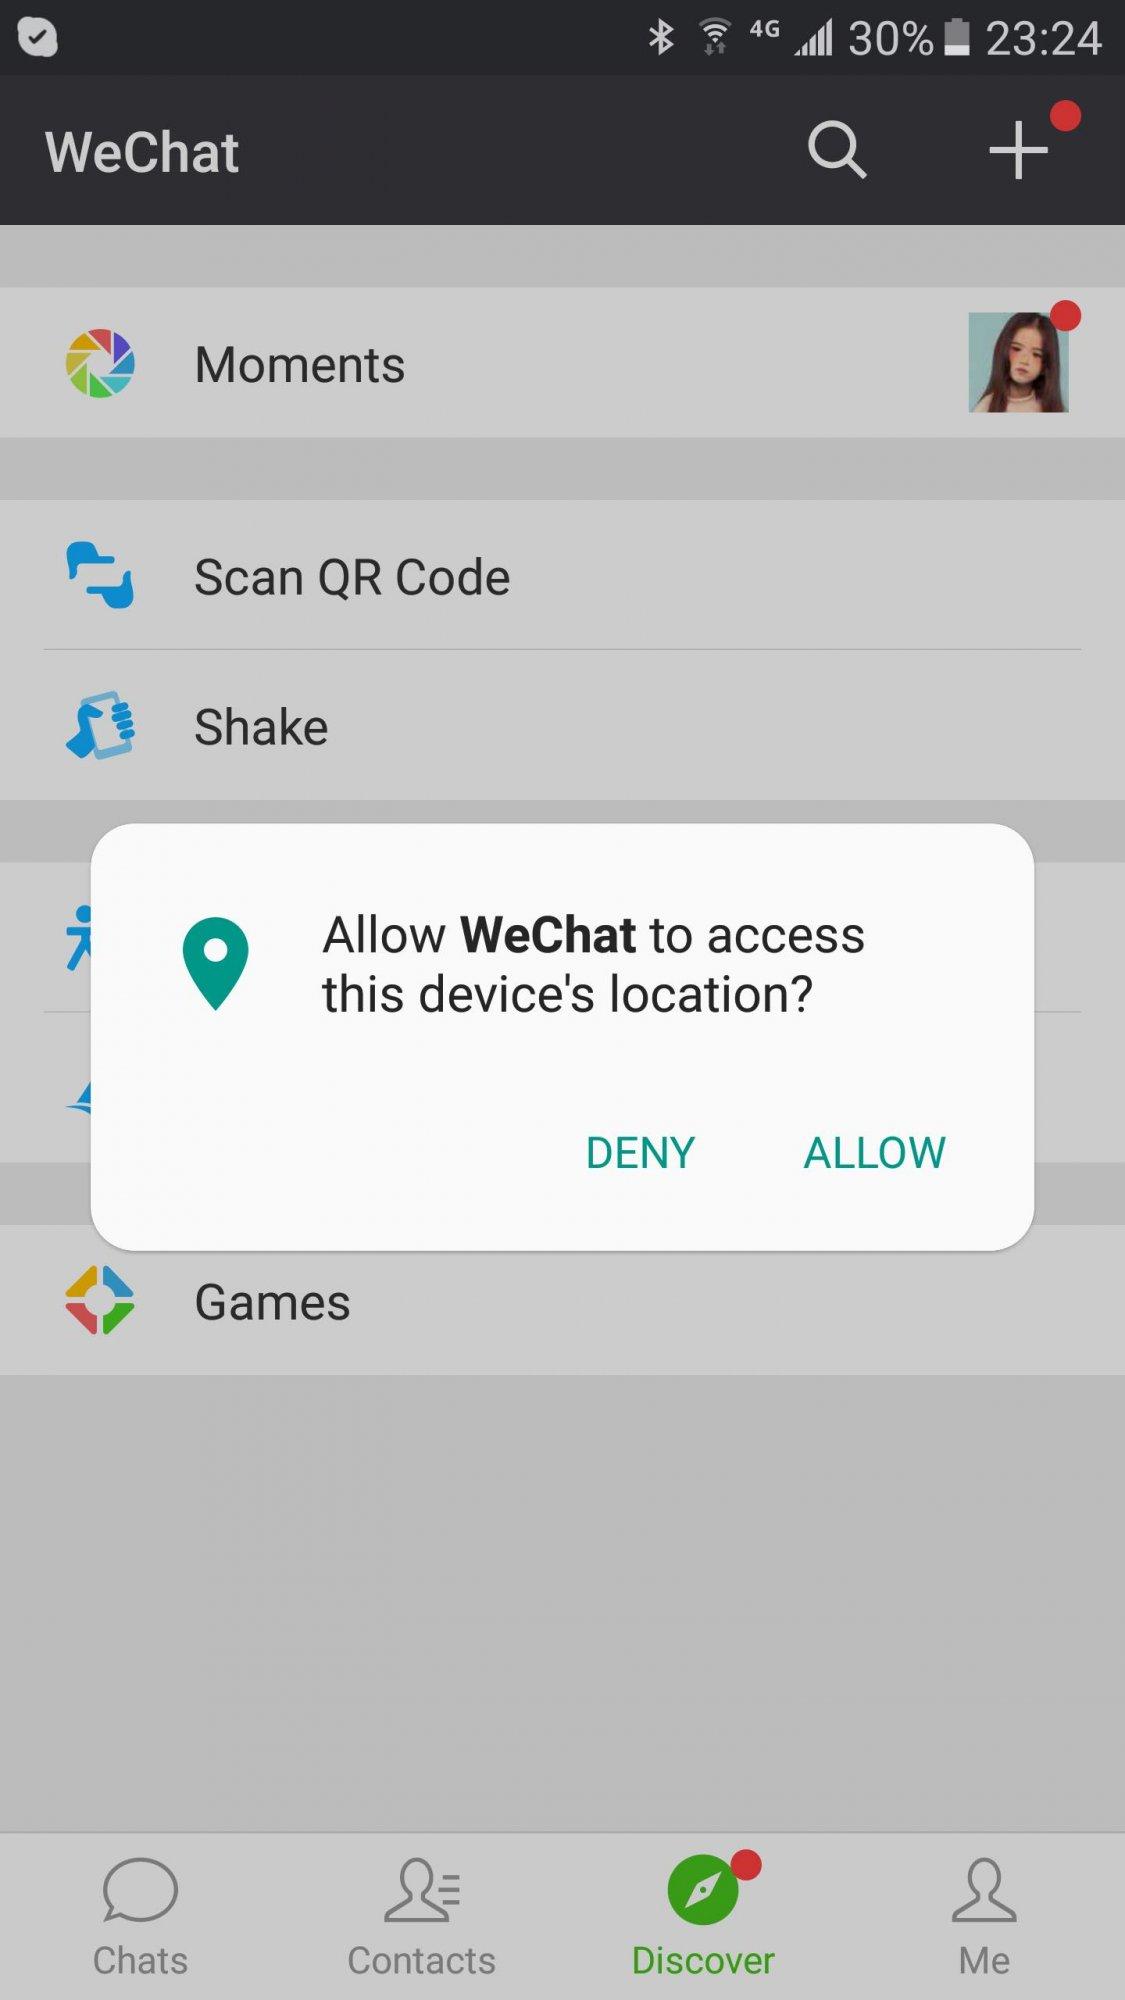 wechatlocation.jpg